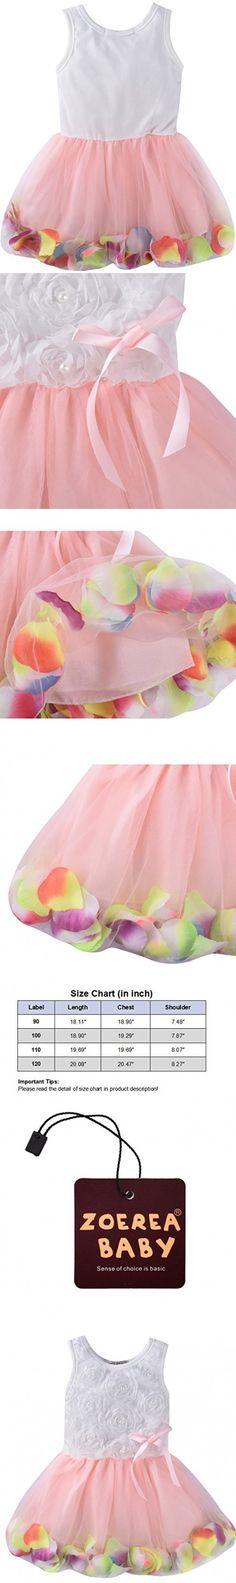 ZOEREA Kids Baby Girls Dress Princess Flower Petal Lace Ruffled Tulle Skirts